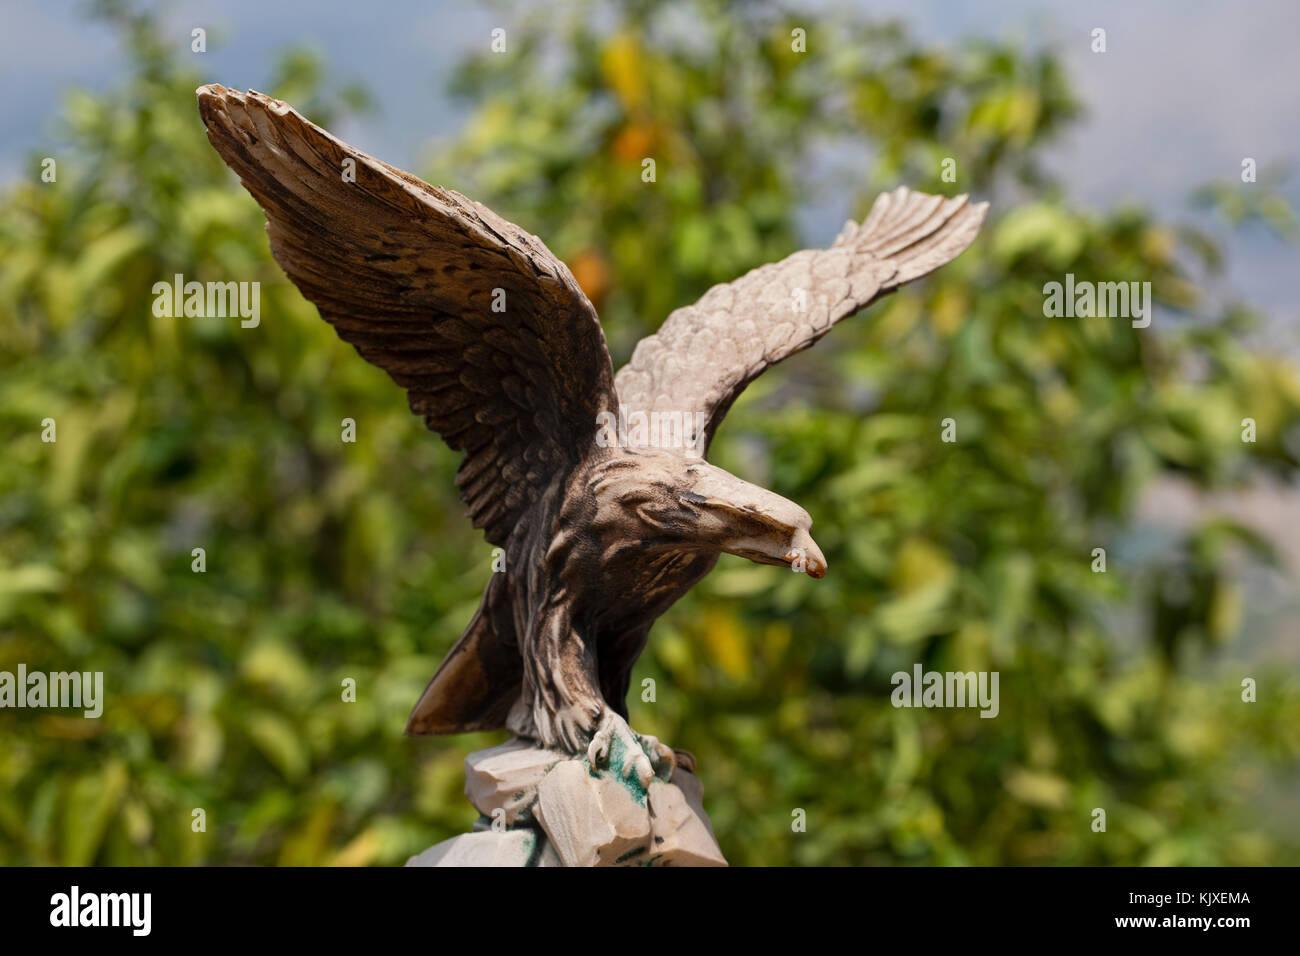 Eagle Statue In A Spanish Garden; Spain